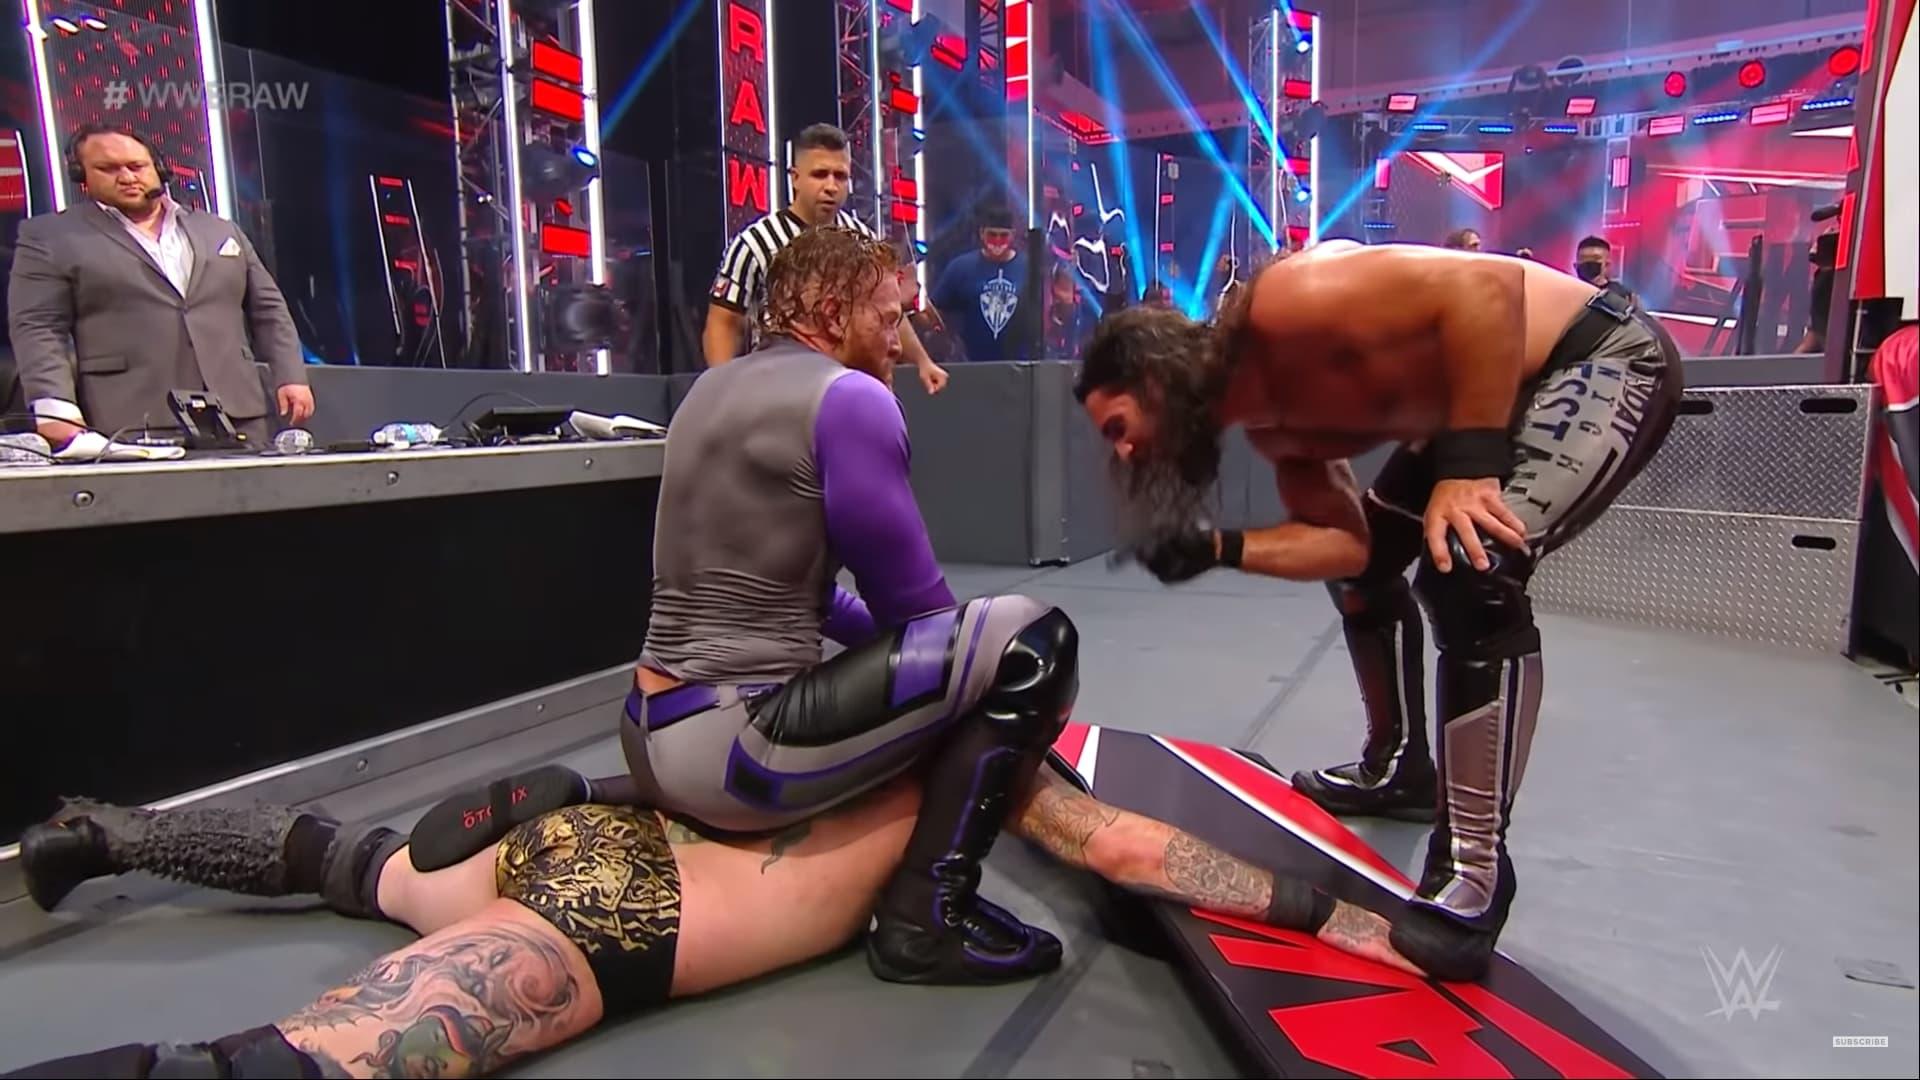 WWE Raw - Season 28 Episode 29 : July 20, 2020 (1970)